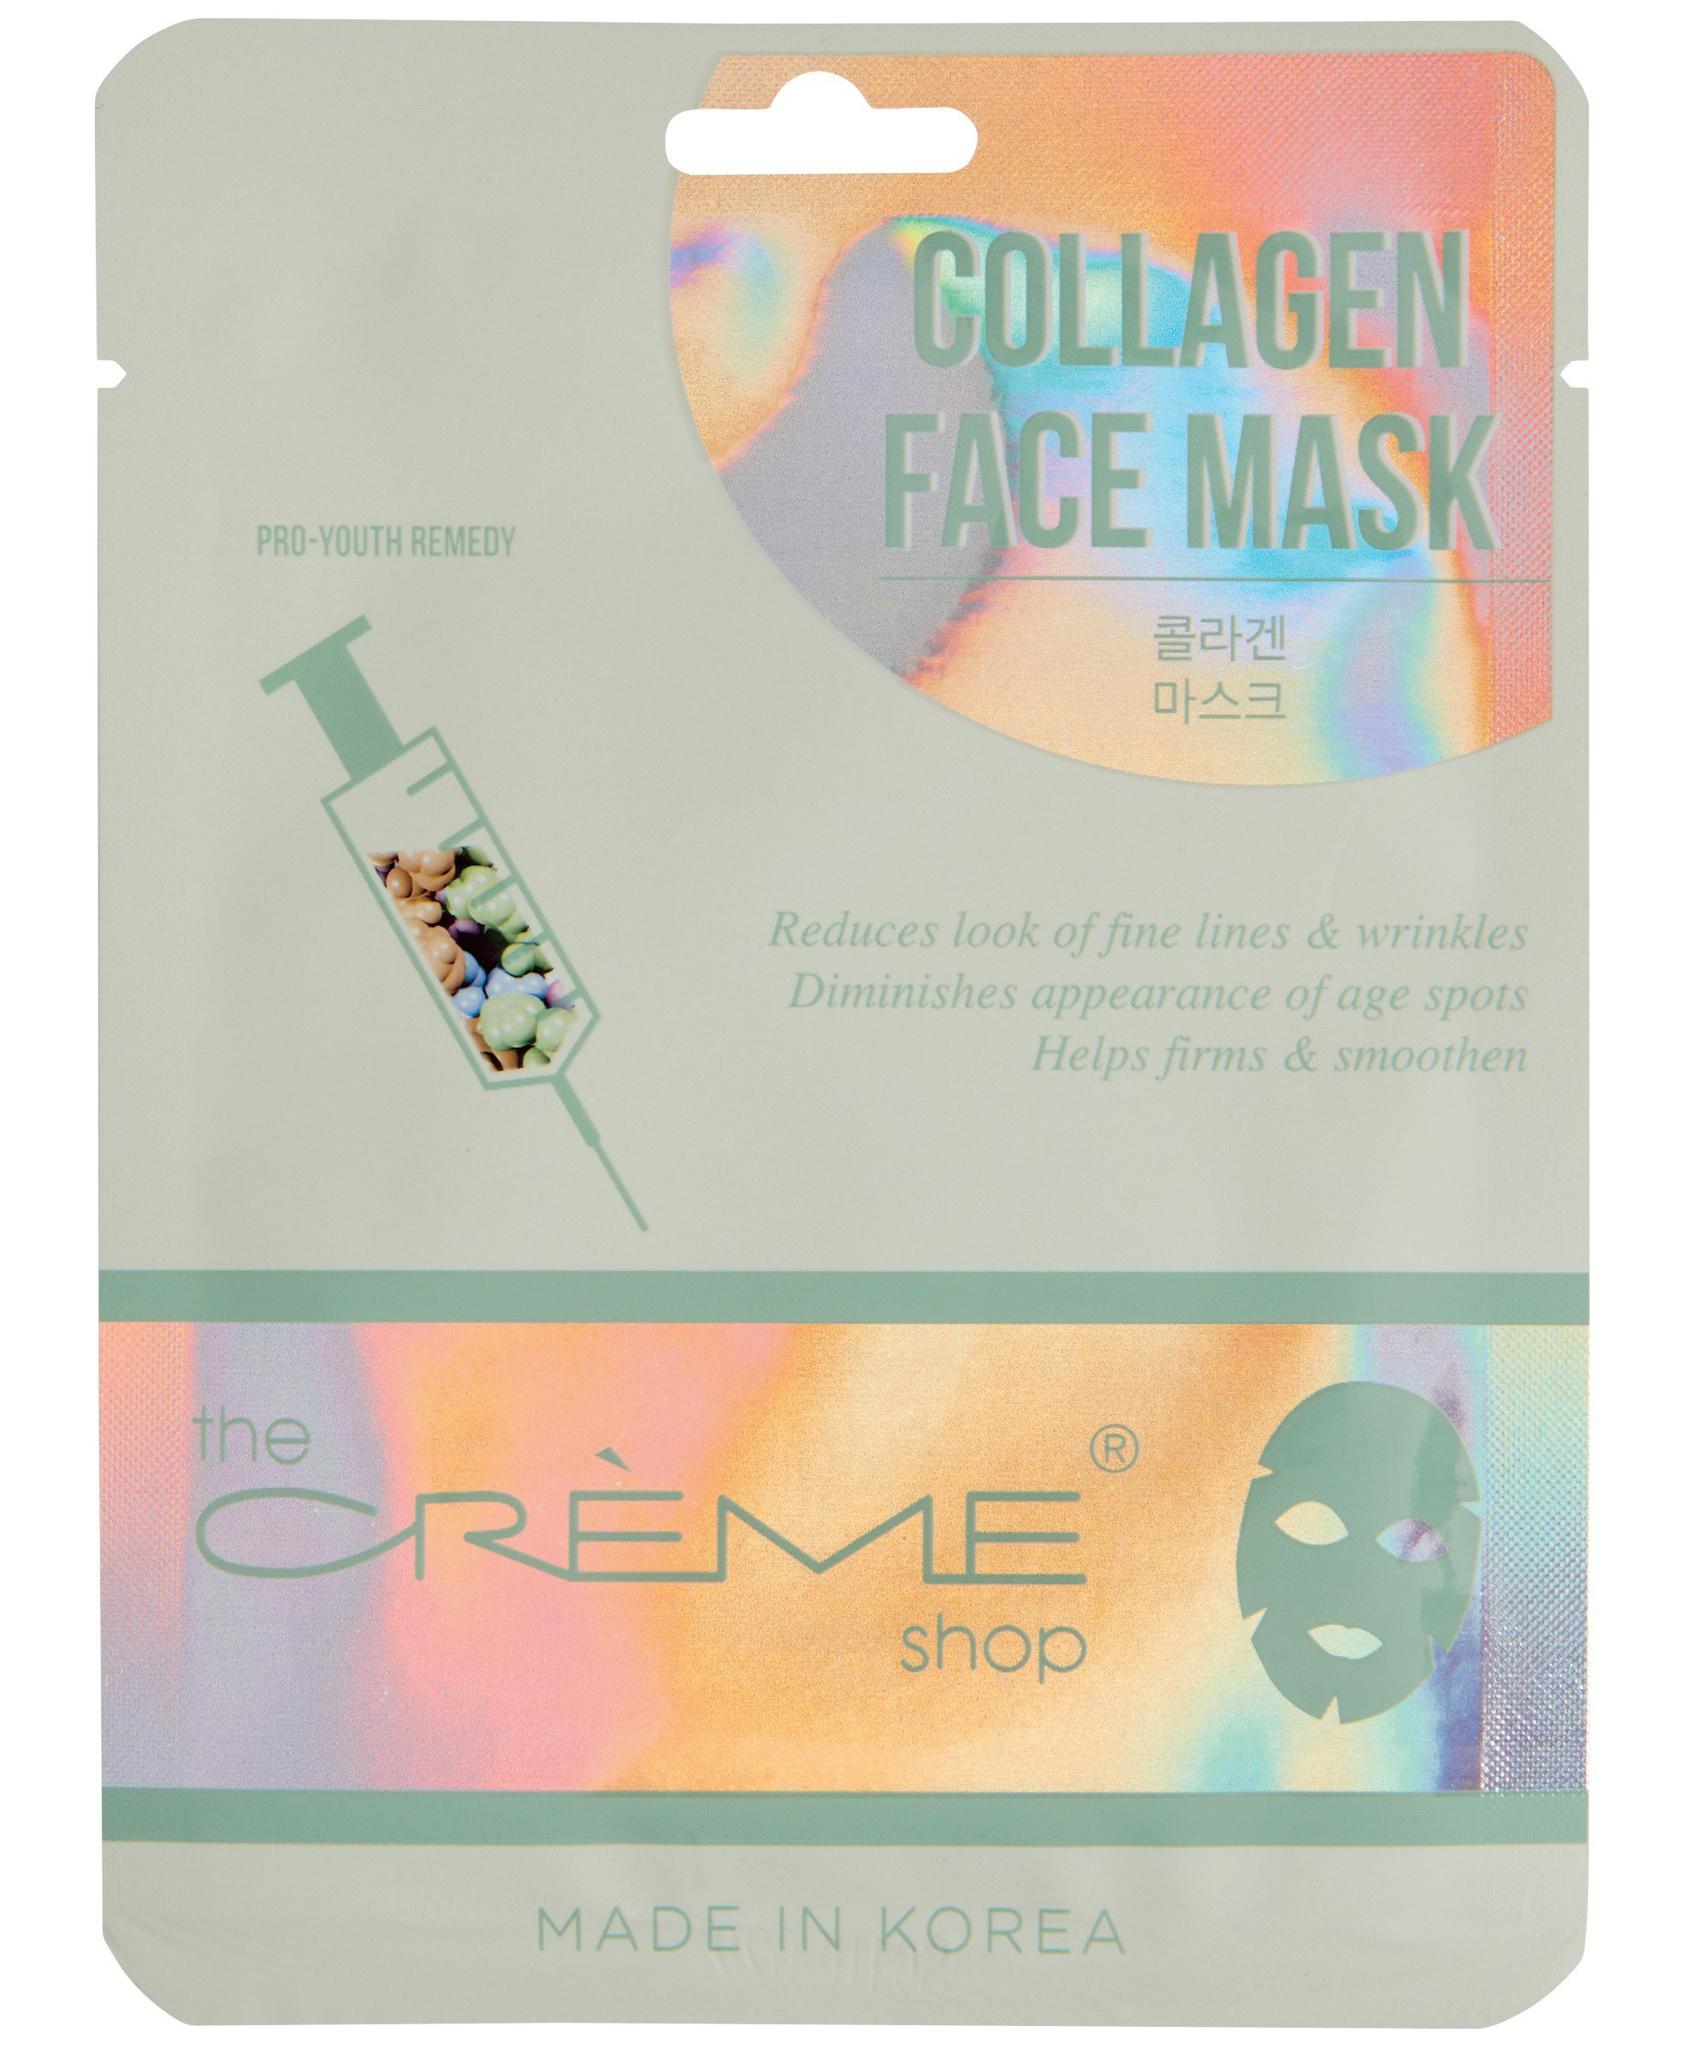 The Creme Shop Collagen Face Mask